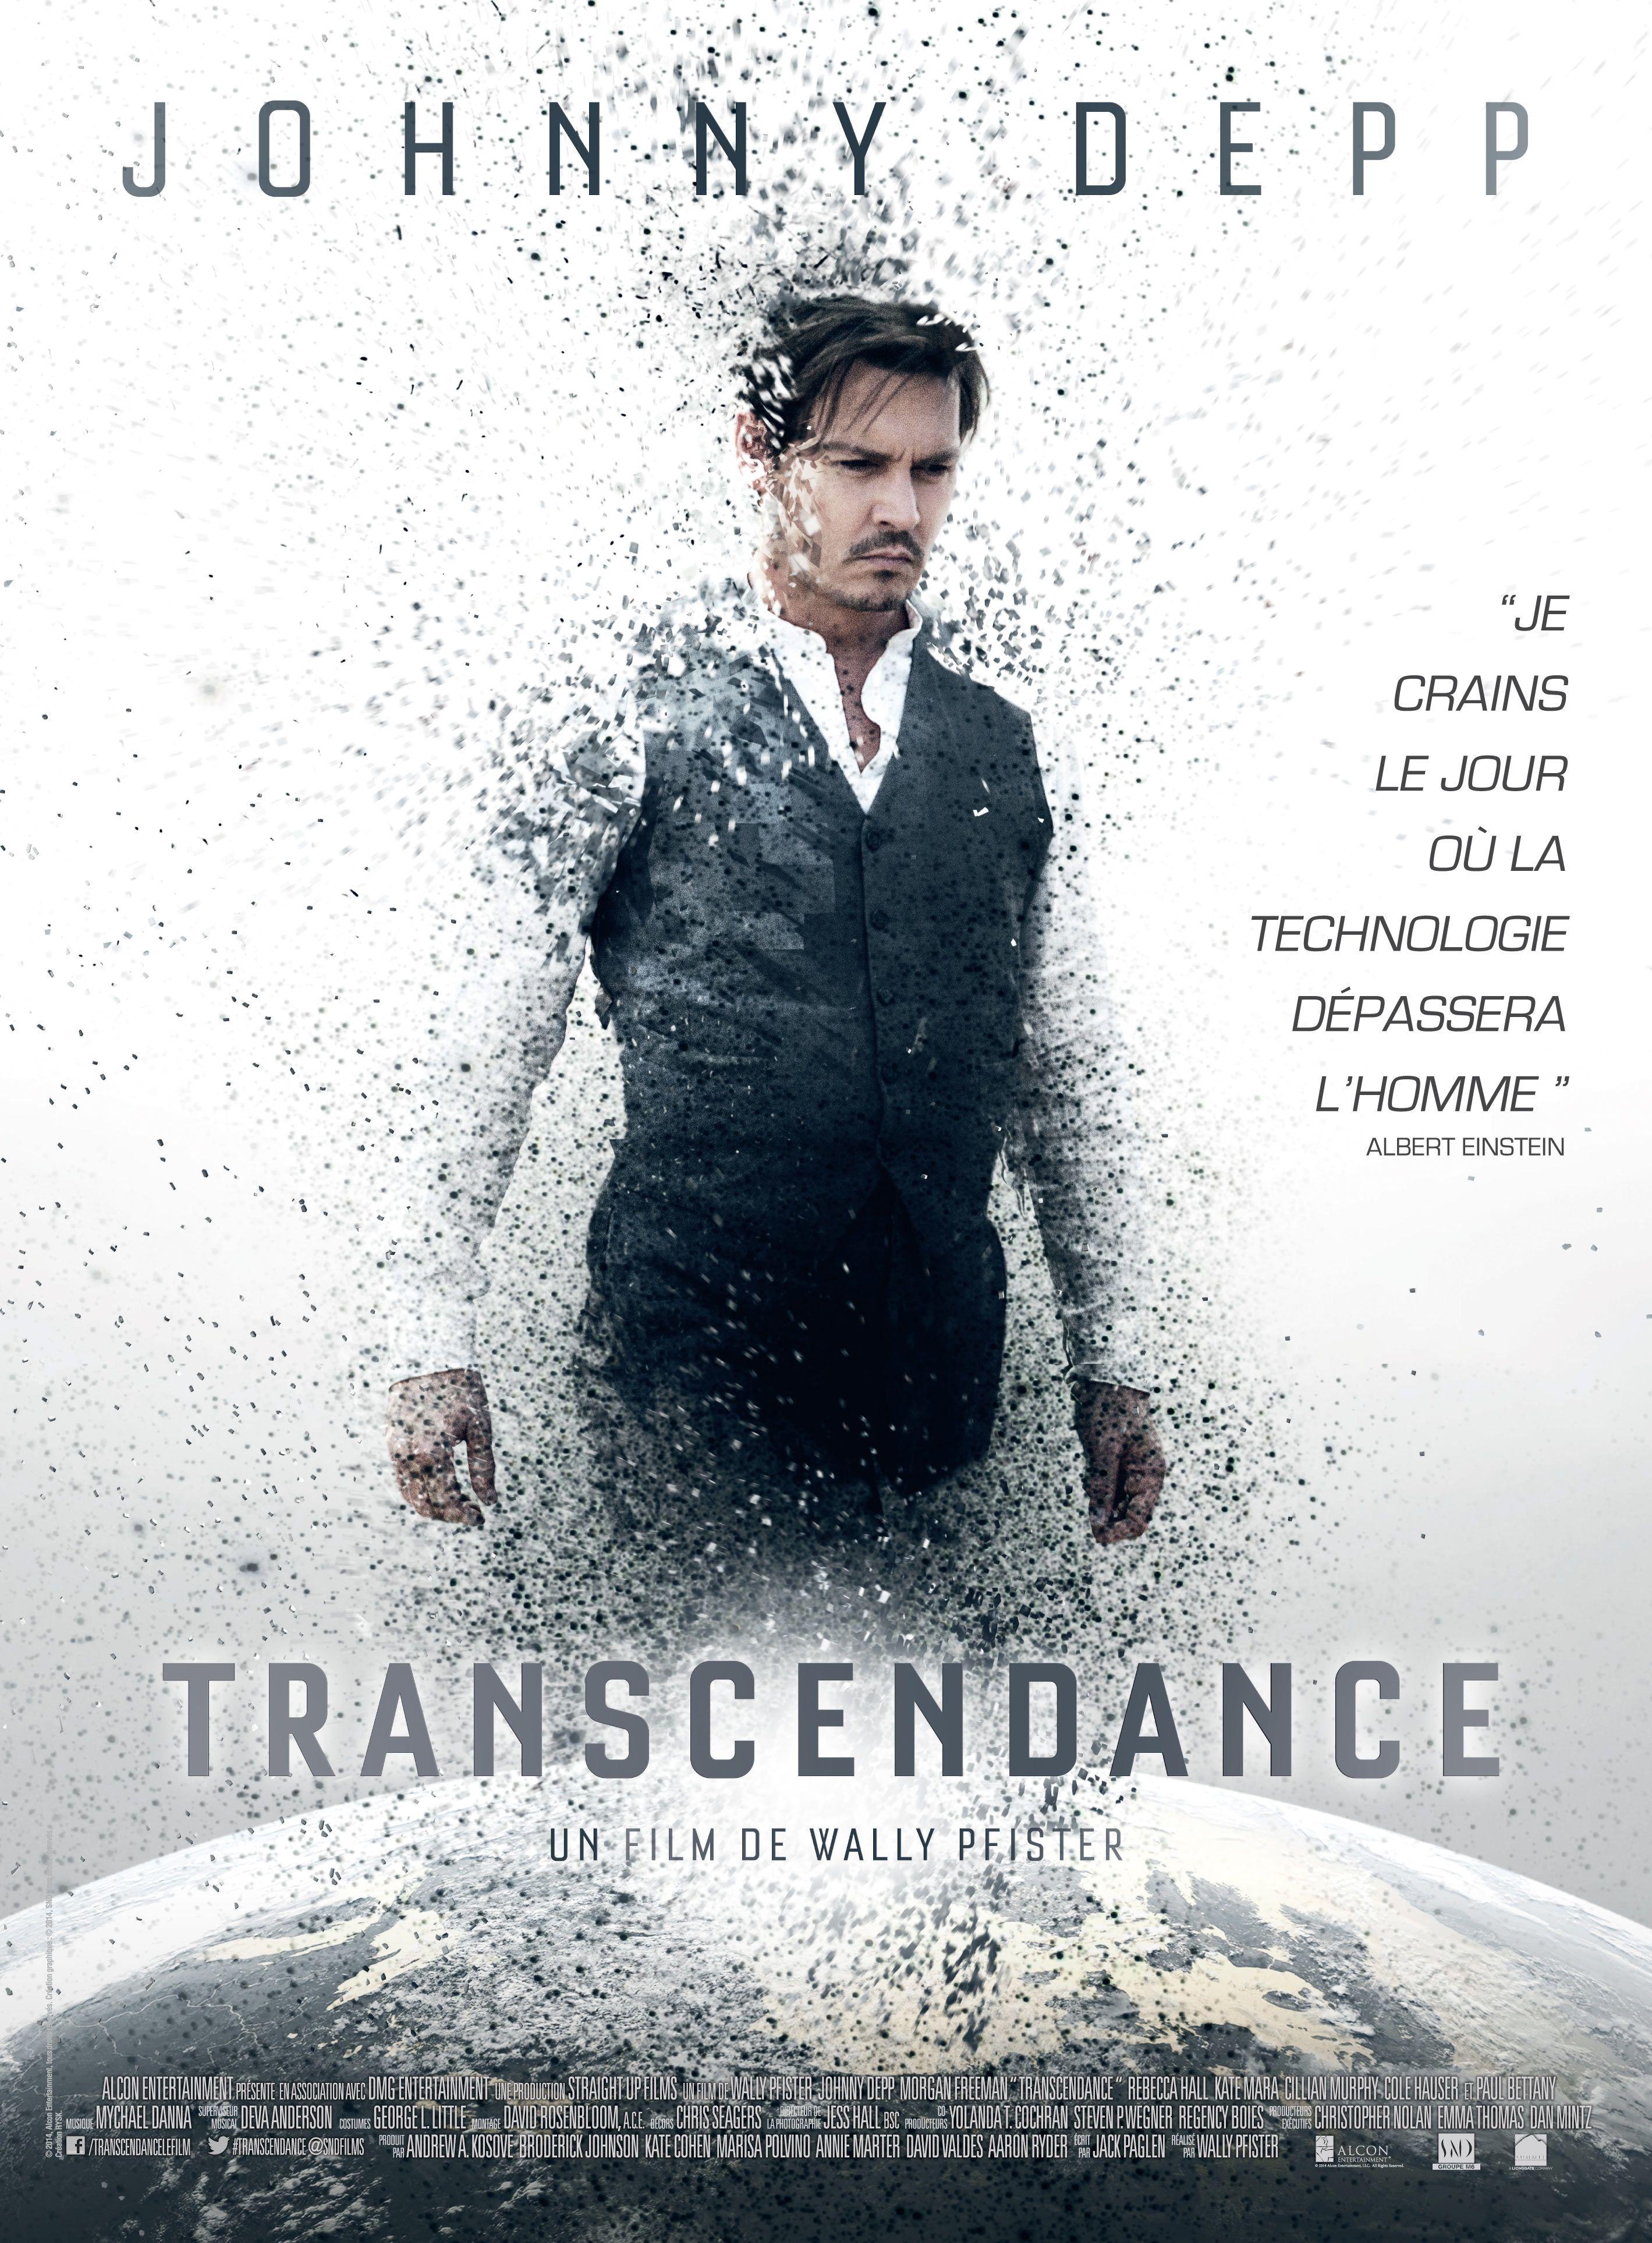 Cinemactu Adli Kullanicinin Les Nouvelles Videos Et Bandes Annonces Panosundaki Pin Film Posteri Film Evrim